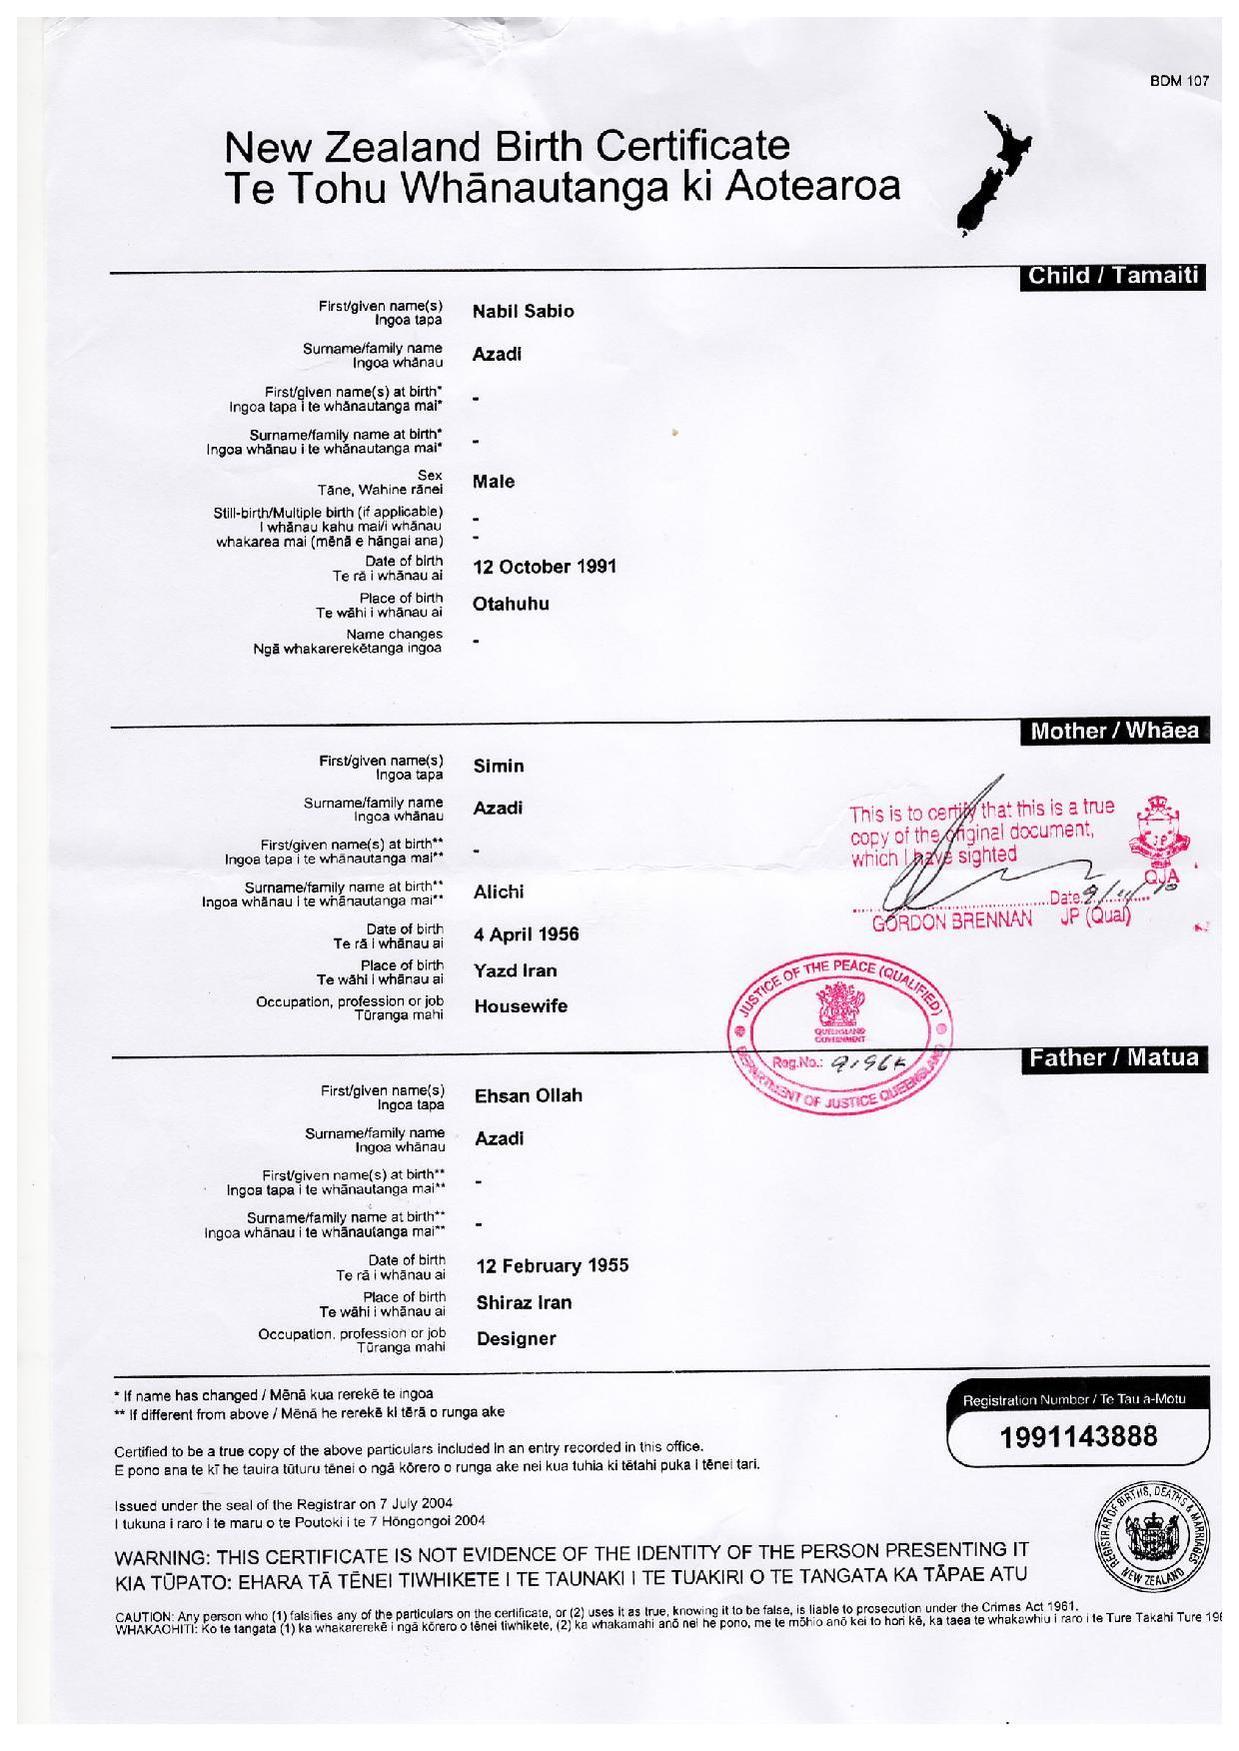 Filenabil sabio azadis birth certificatepdf wikimedia commons filenabil sabio azadis birth certificatepdf aiddatafo Images